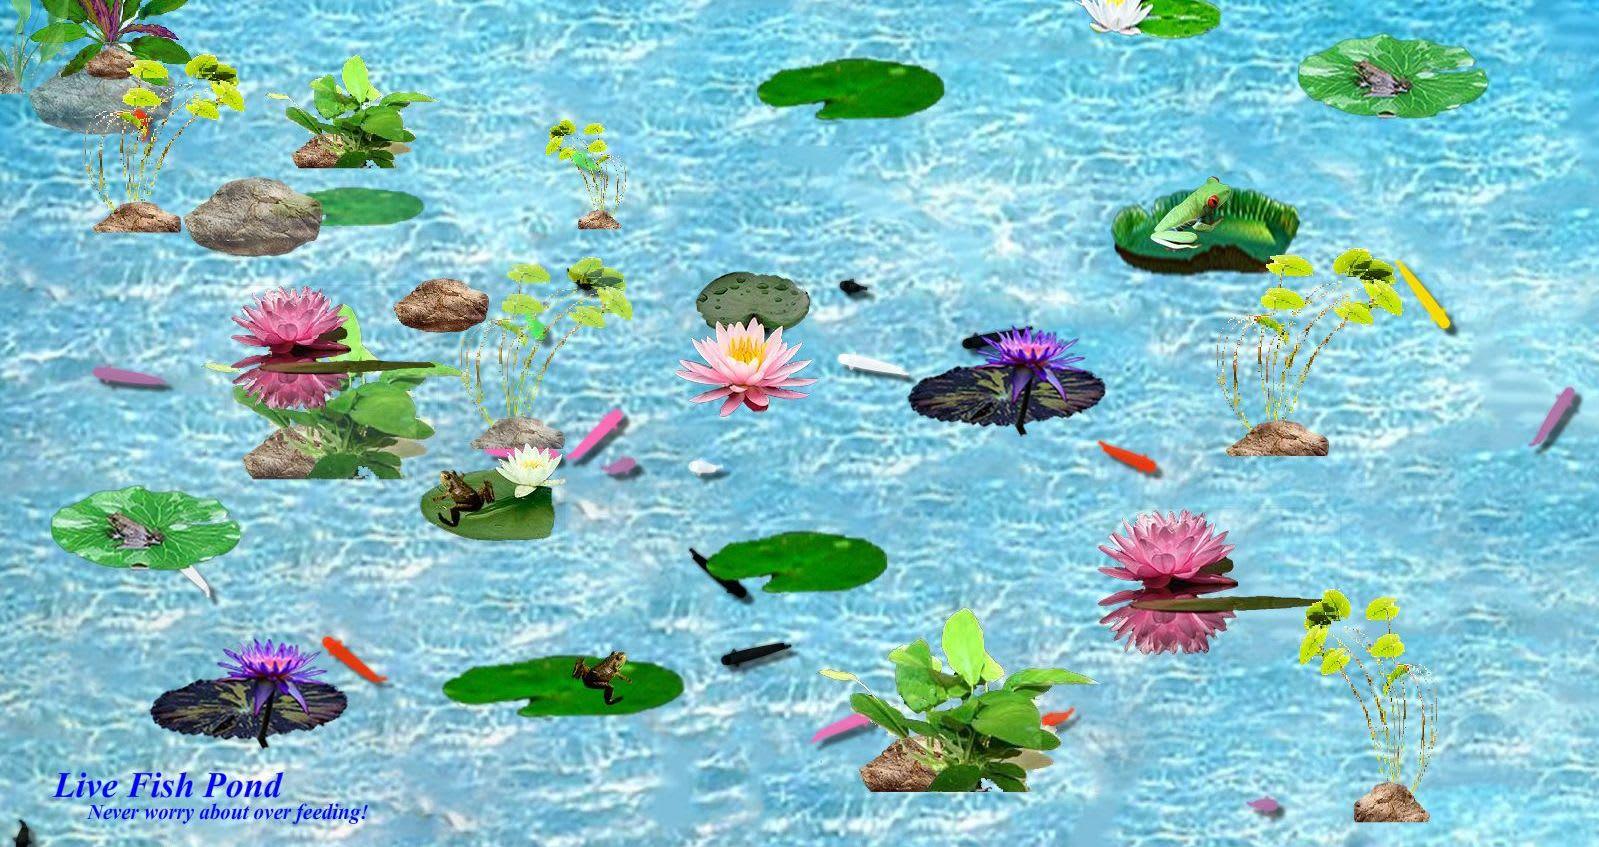 Interactive Fish Pond Game